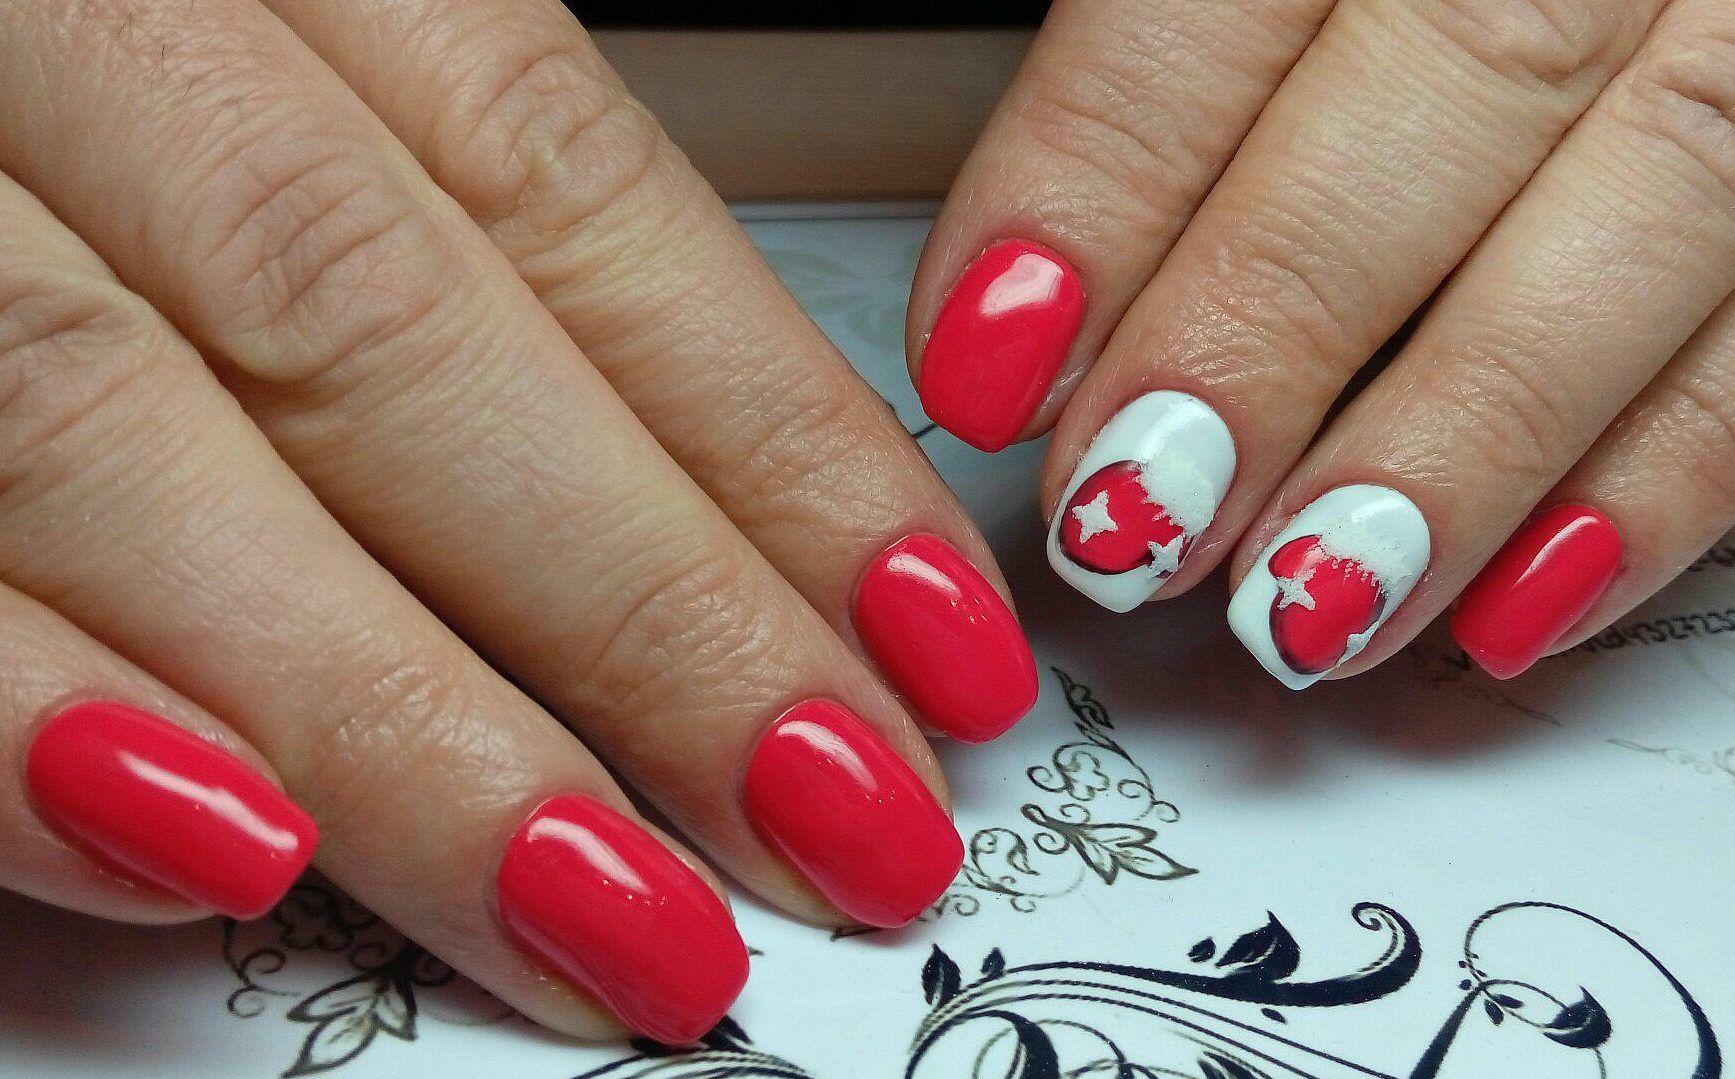 Nail Art #3599 - Best Nail Art Designs Gallery | Pinterest | Nail ...